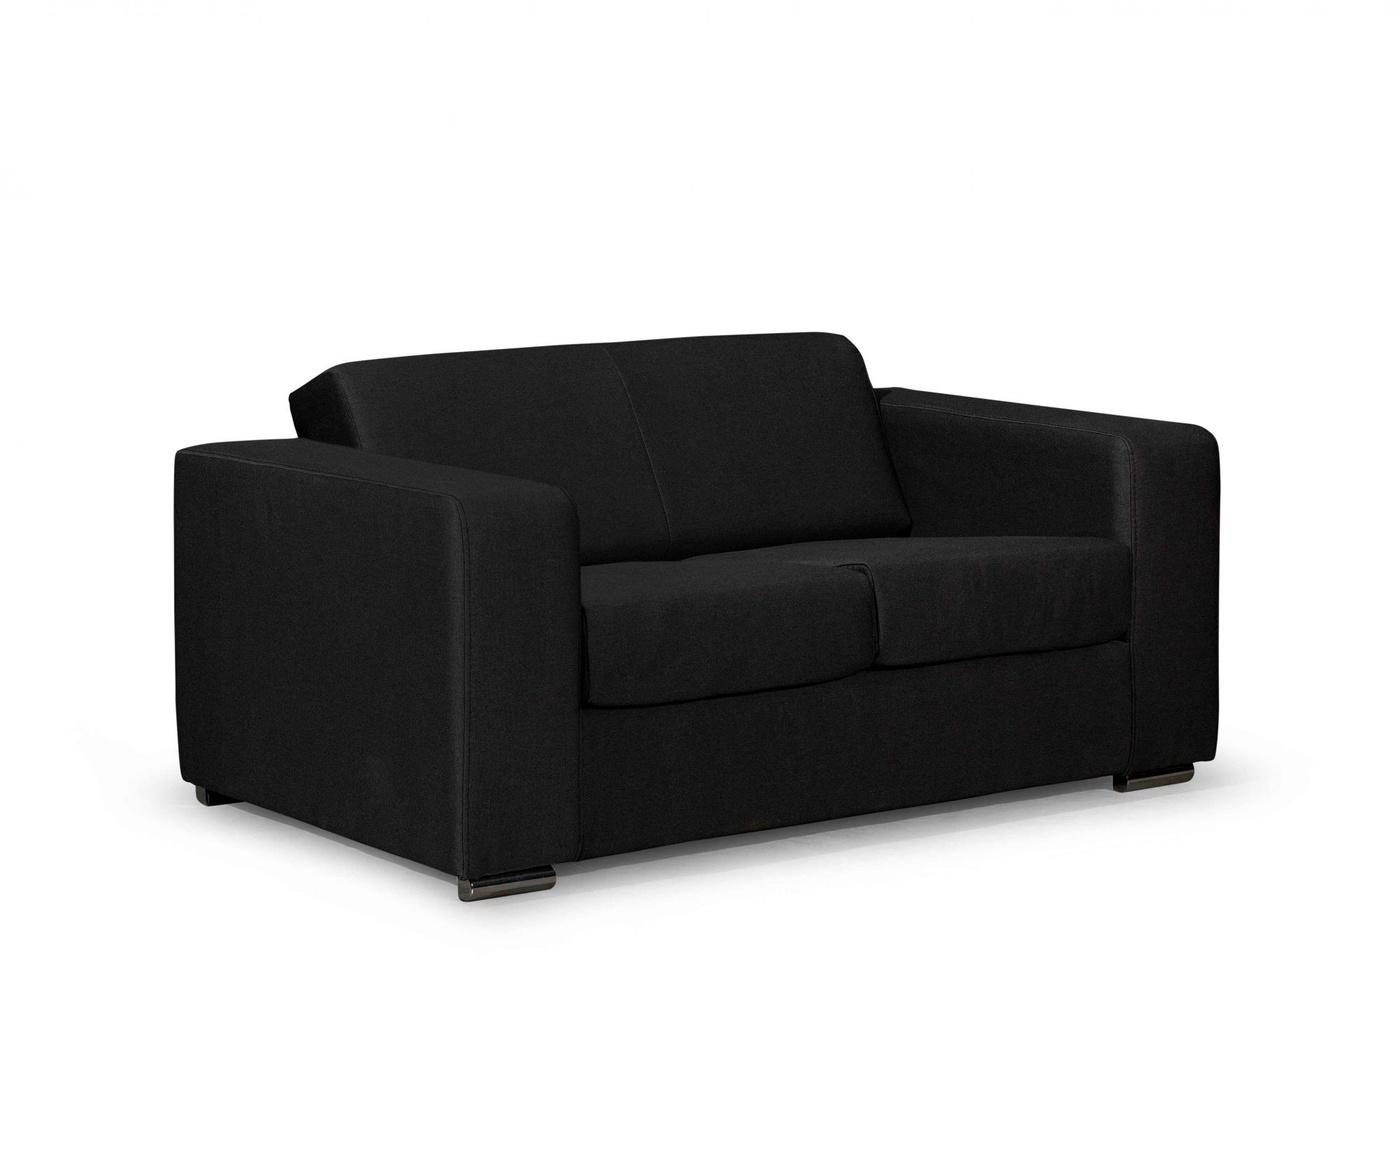 Kauč dvosjed Ava Bladen Black